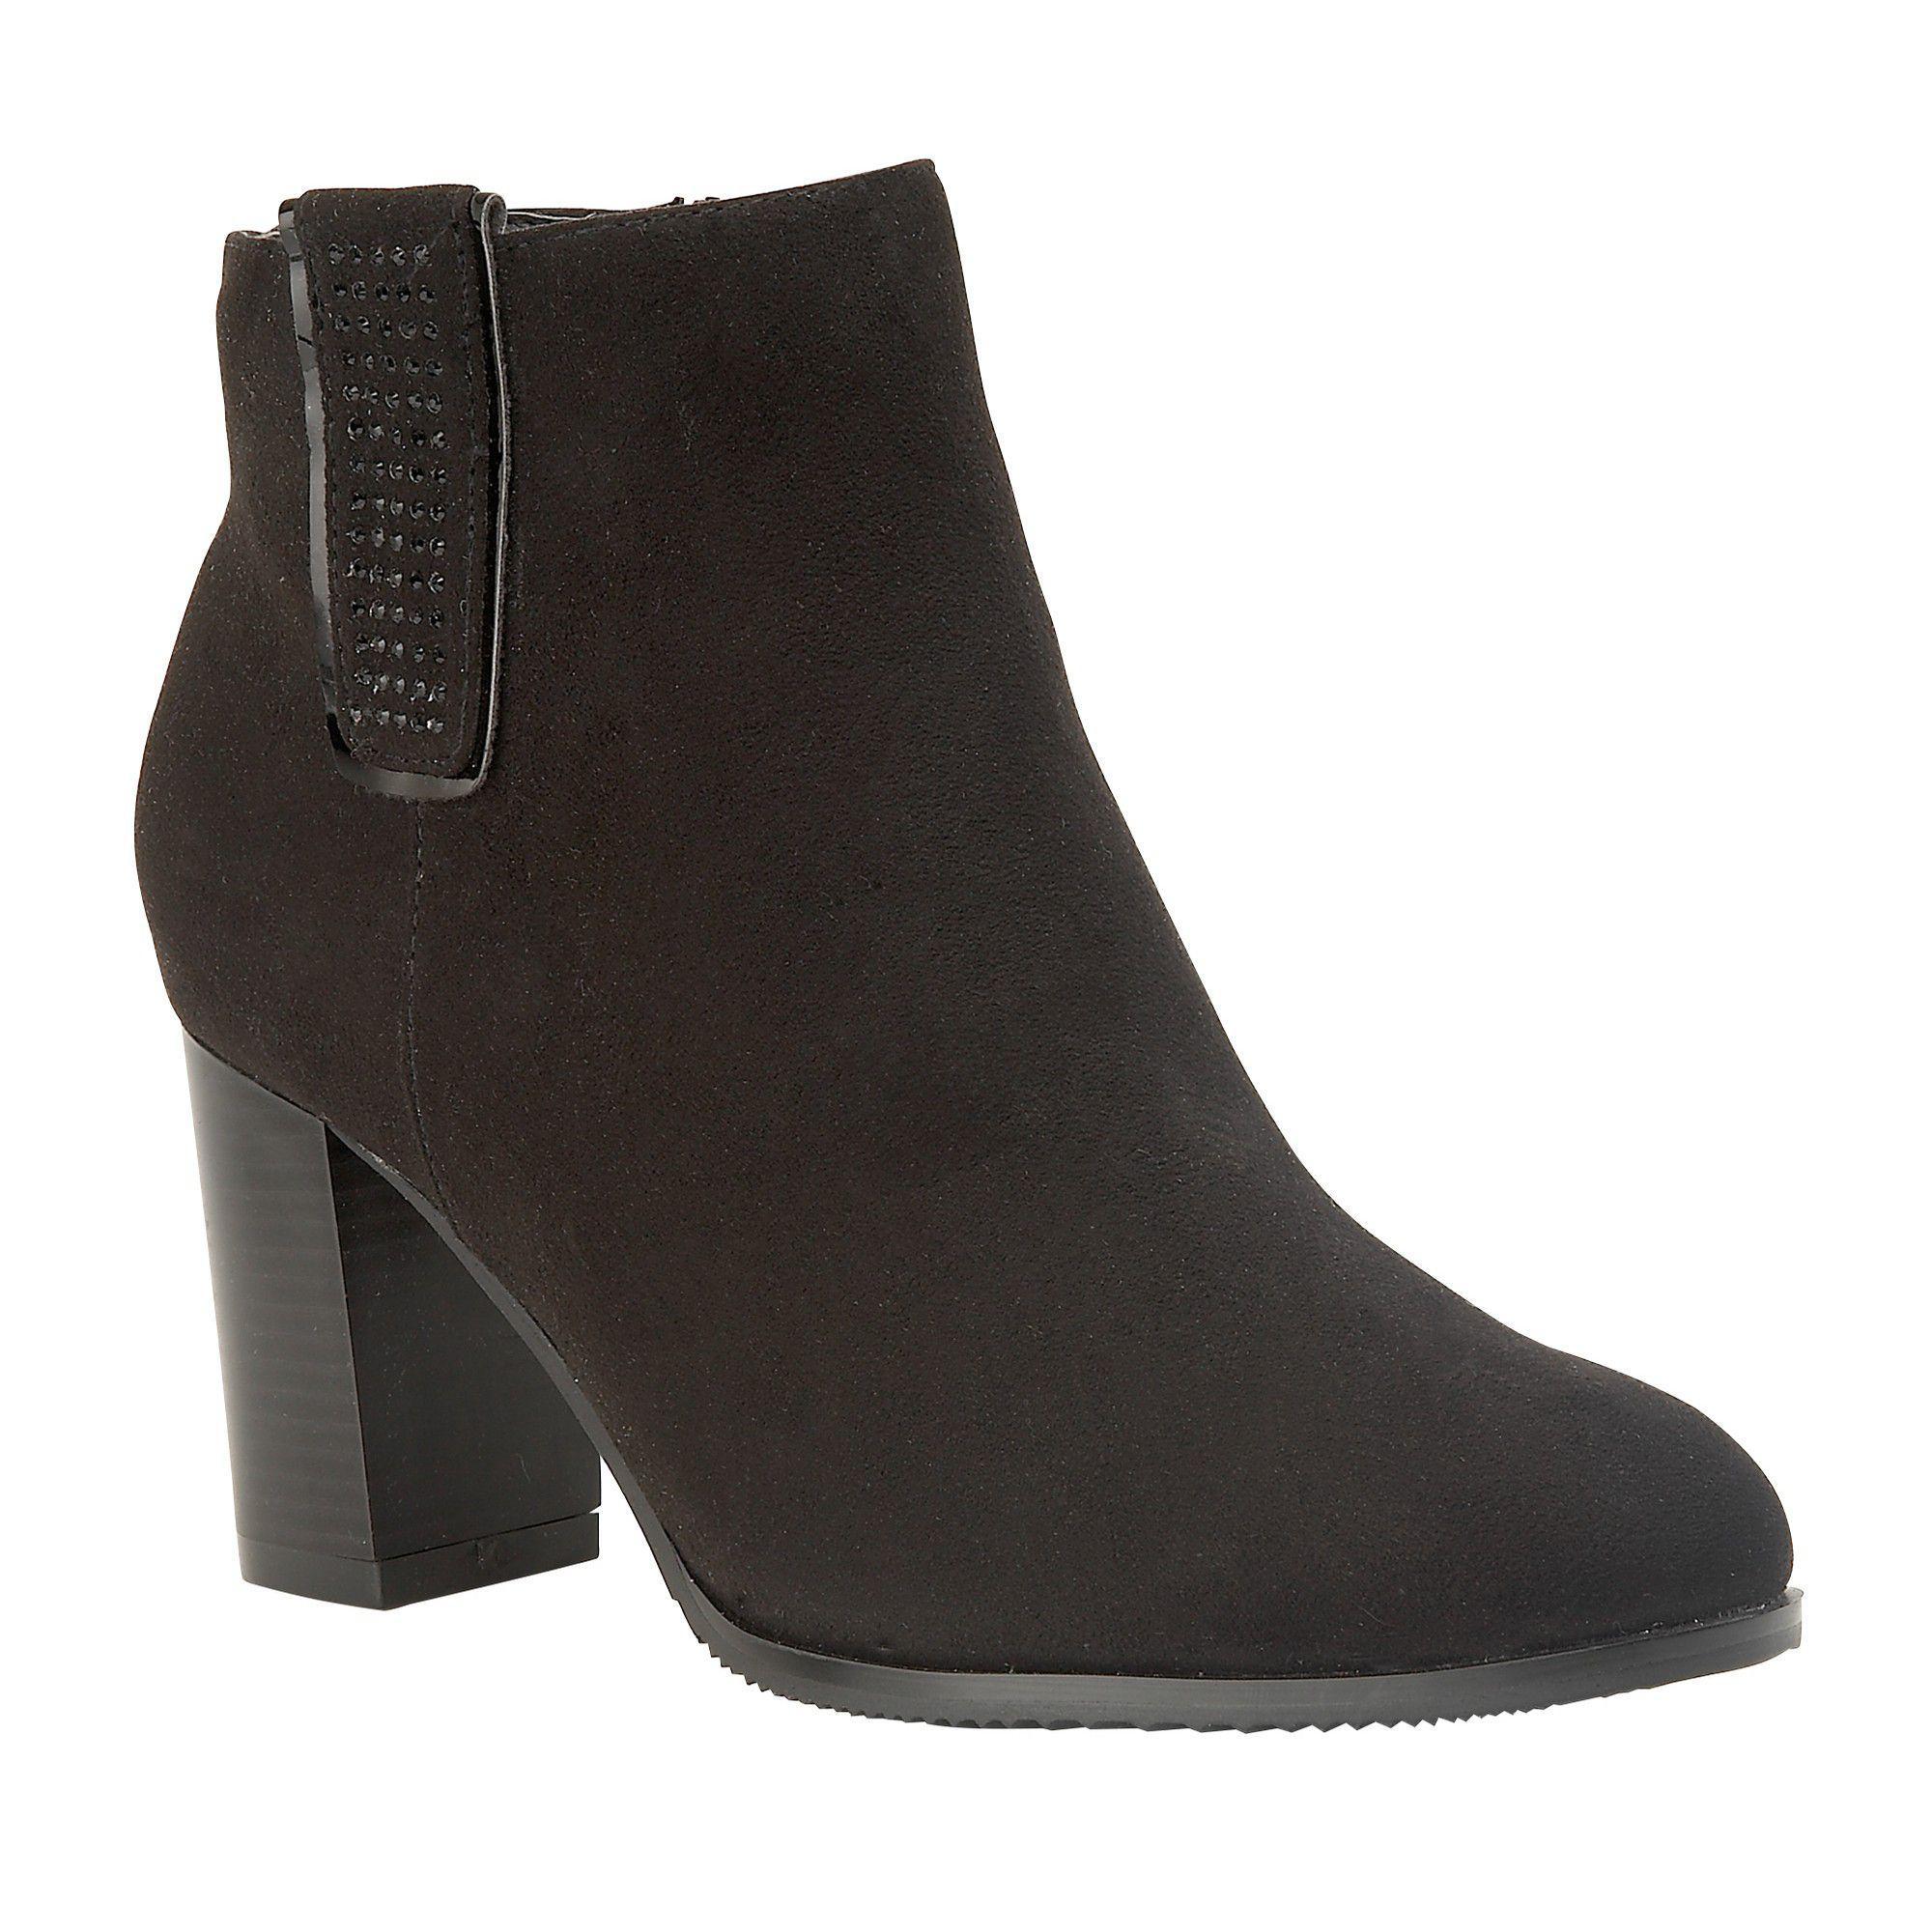 969e39c9cc01 Lotus Black  jenolan  High Block Heel Ankle Boots in Black - Lyst